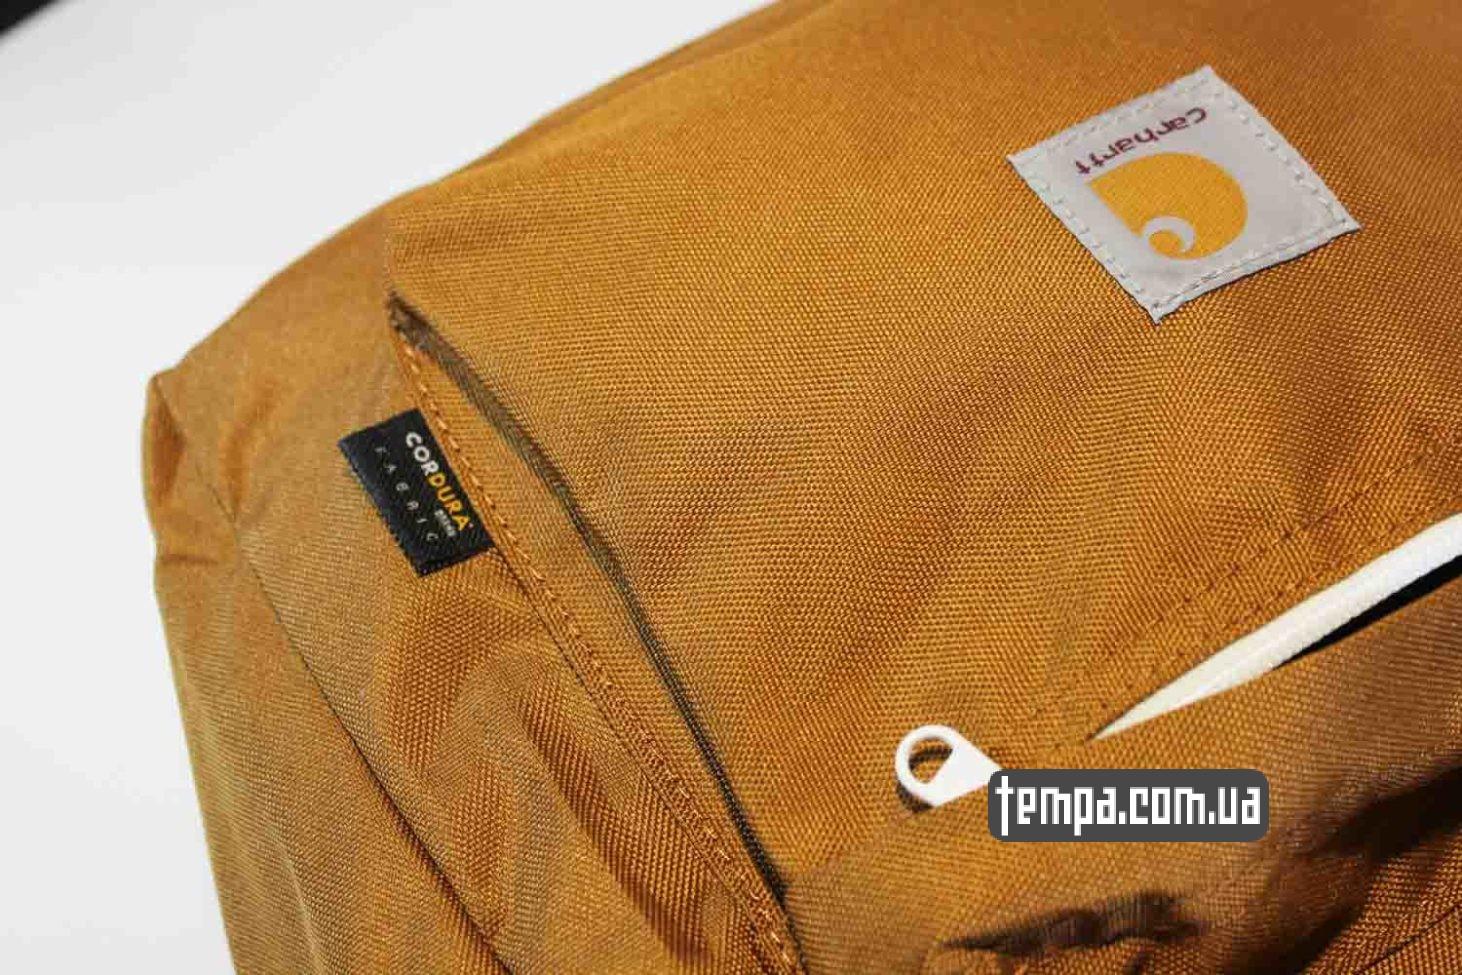 Carhartt borwn backpack рюкзак Carhartt коричневый купить оригинал bagpack кархартт